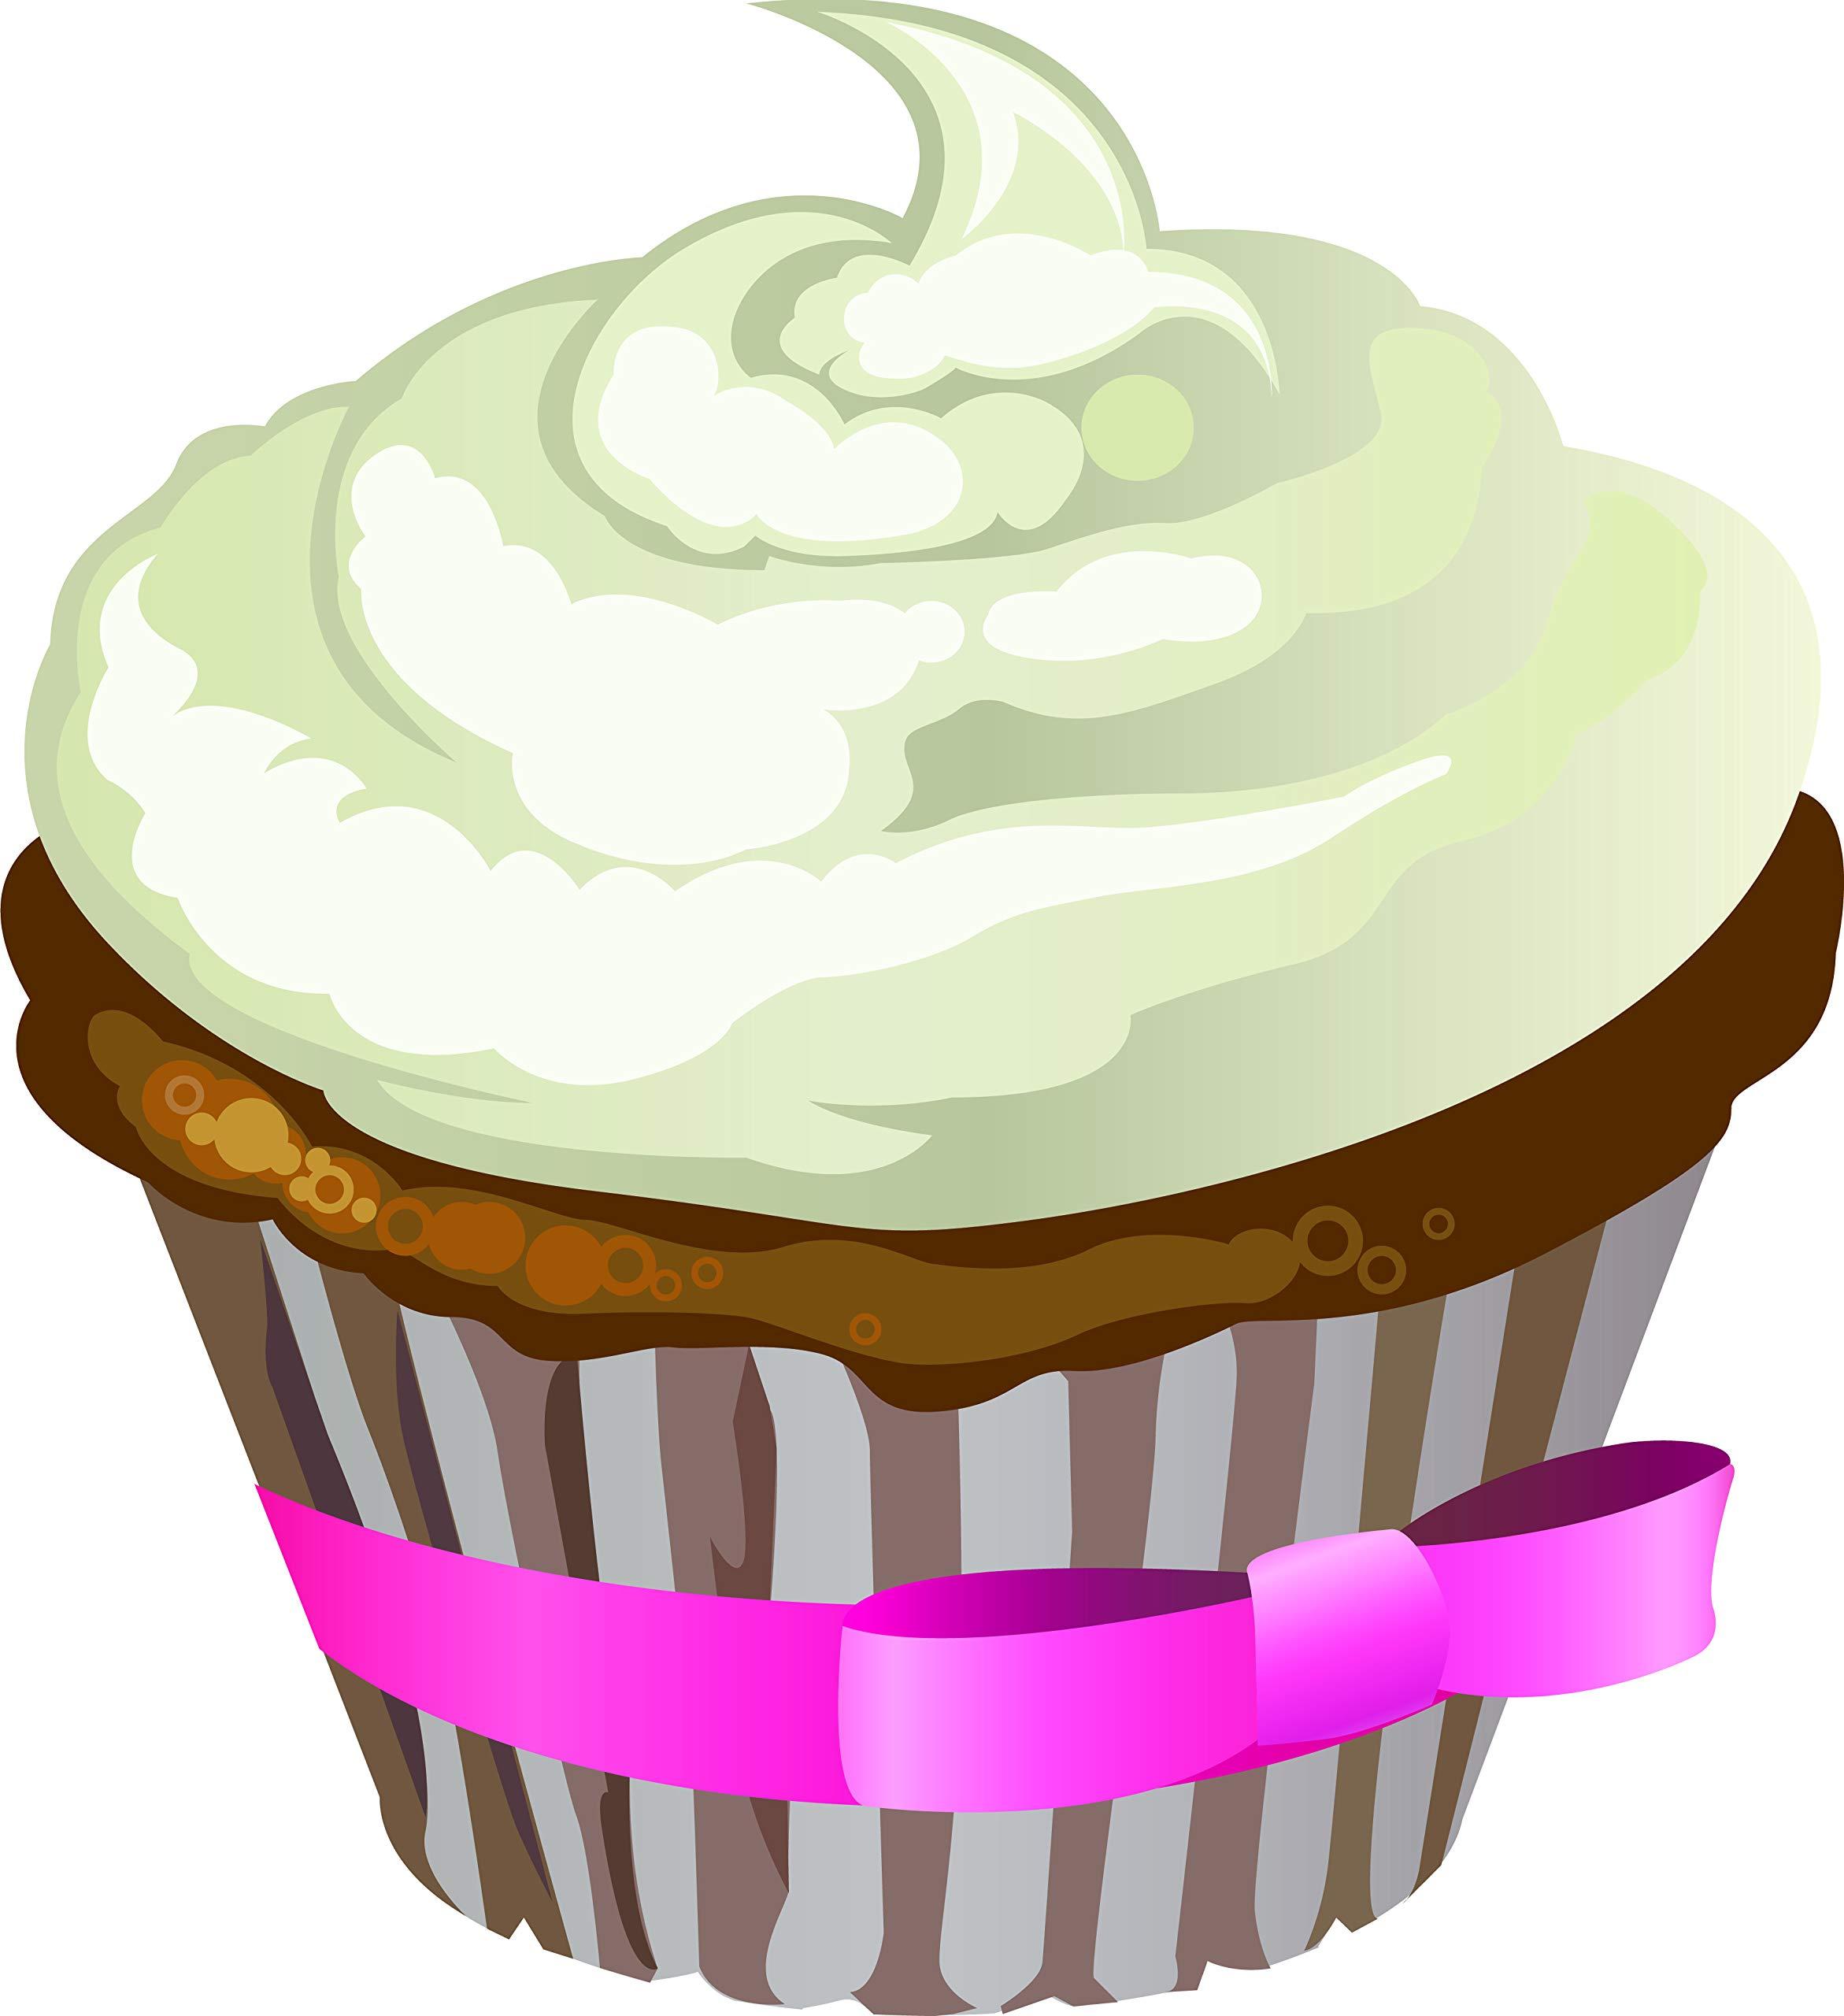 Delicious Desserts Sweets Bakeshop Bakery Cartoon Vinyl Sticker, Cupcake by Shinobi Stickers